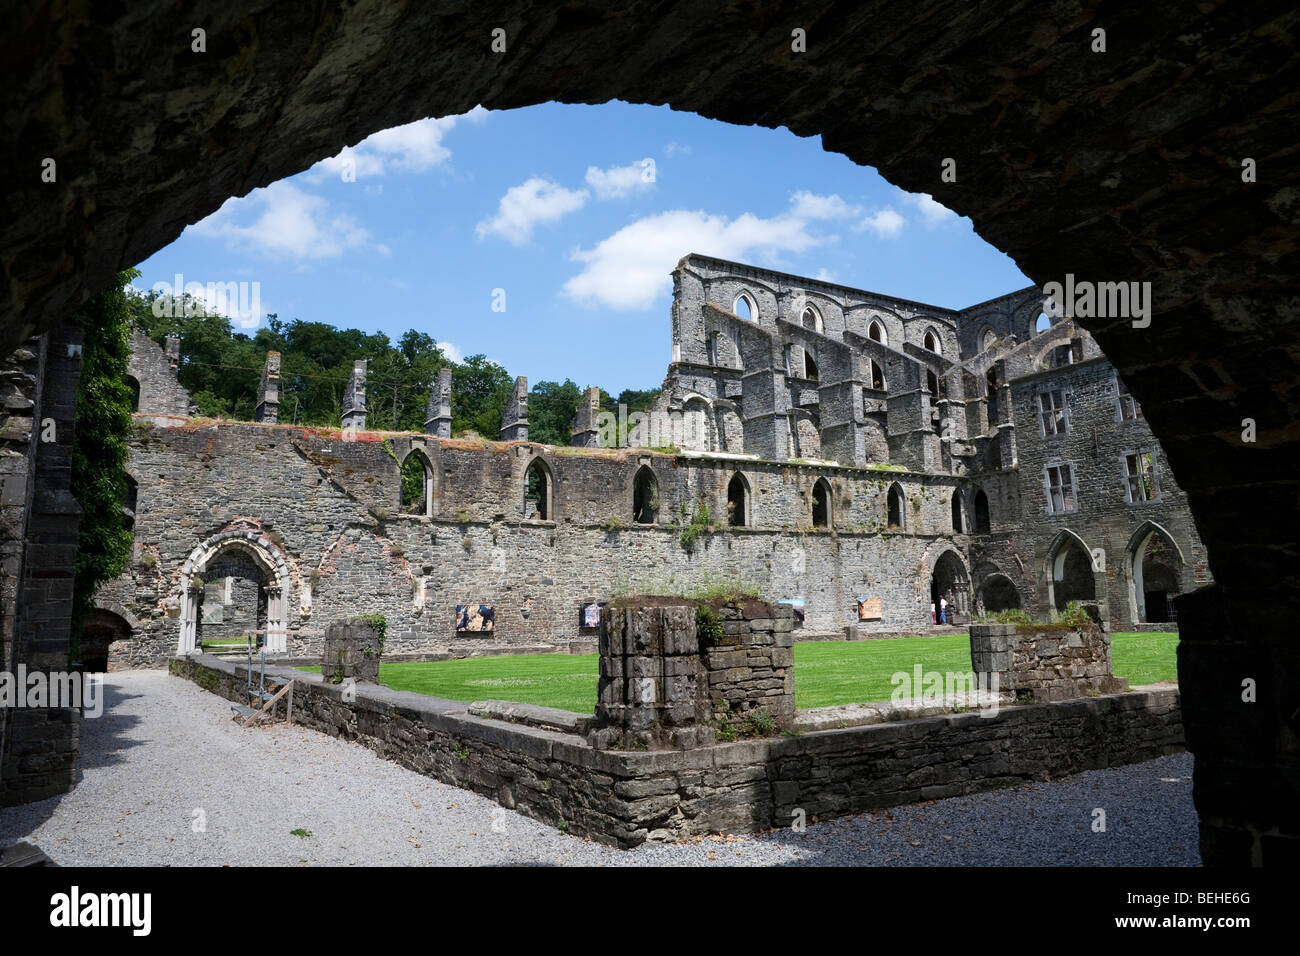 Villers La Ville Abbey. Ruins of Cistercian Abbey through arch. Stock Photo